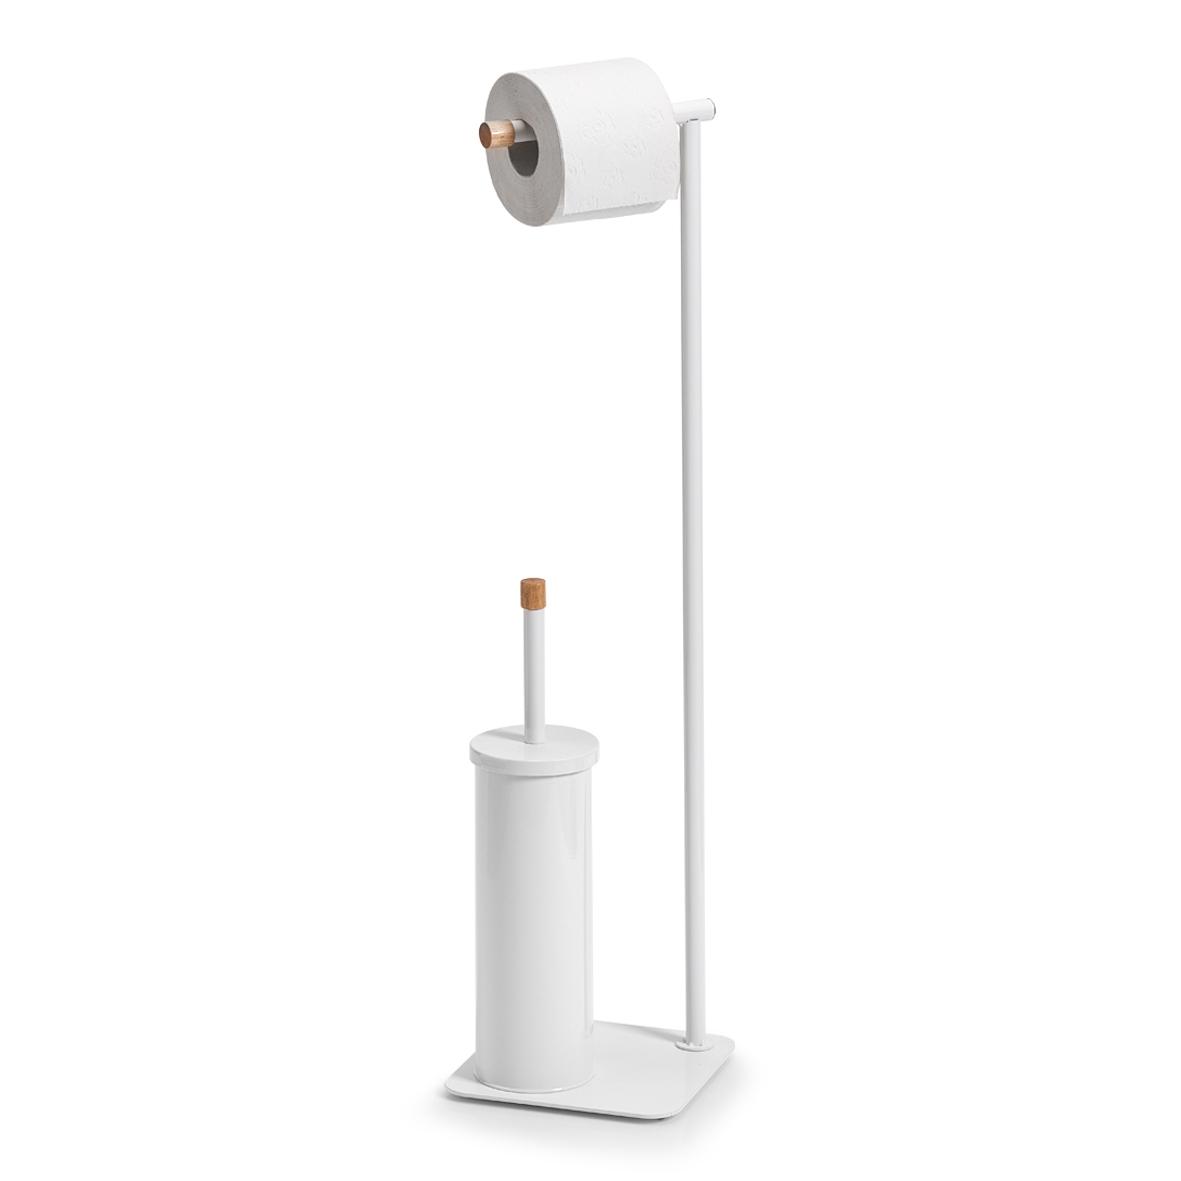 Suport pentru hartie igienica si perie de toaleta, Rubber Metal White, l19xA19xH75 cm poza